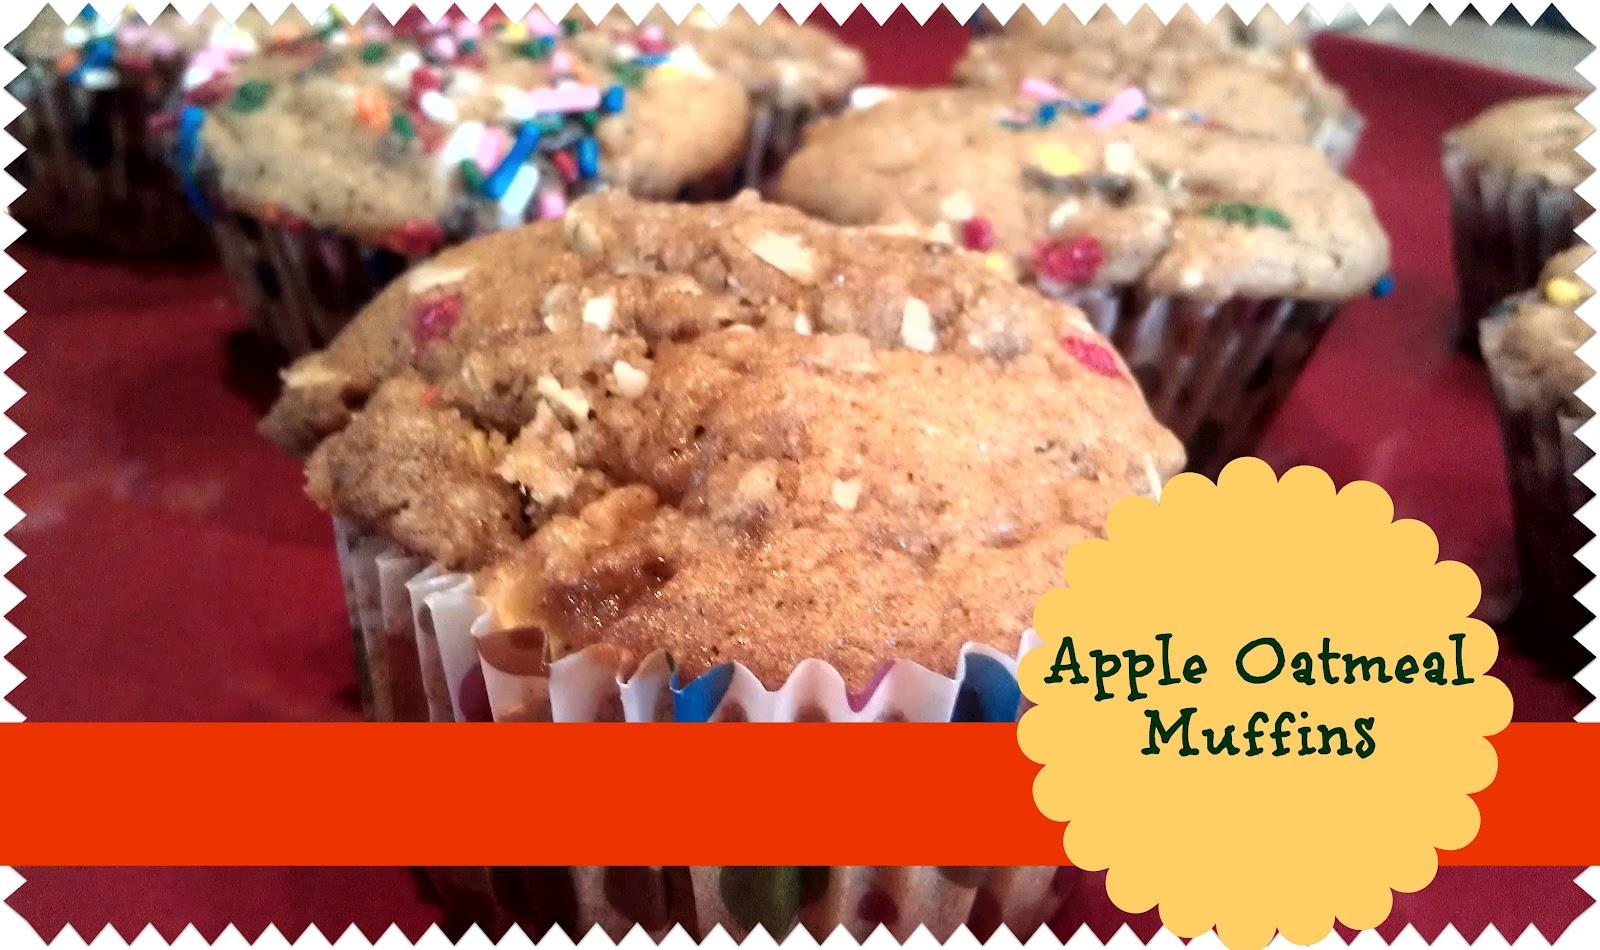 http://3.bp.blogspot.com/-cpOmoAXrs0A/UFEMcIvoxZI/AAAAAAAAEWQ/z9snJs6TYQQ/s1600/muffins.jpg